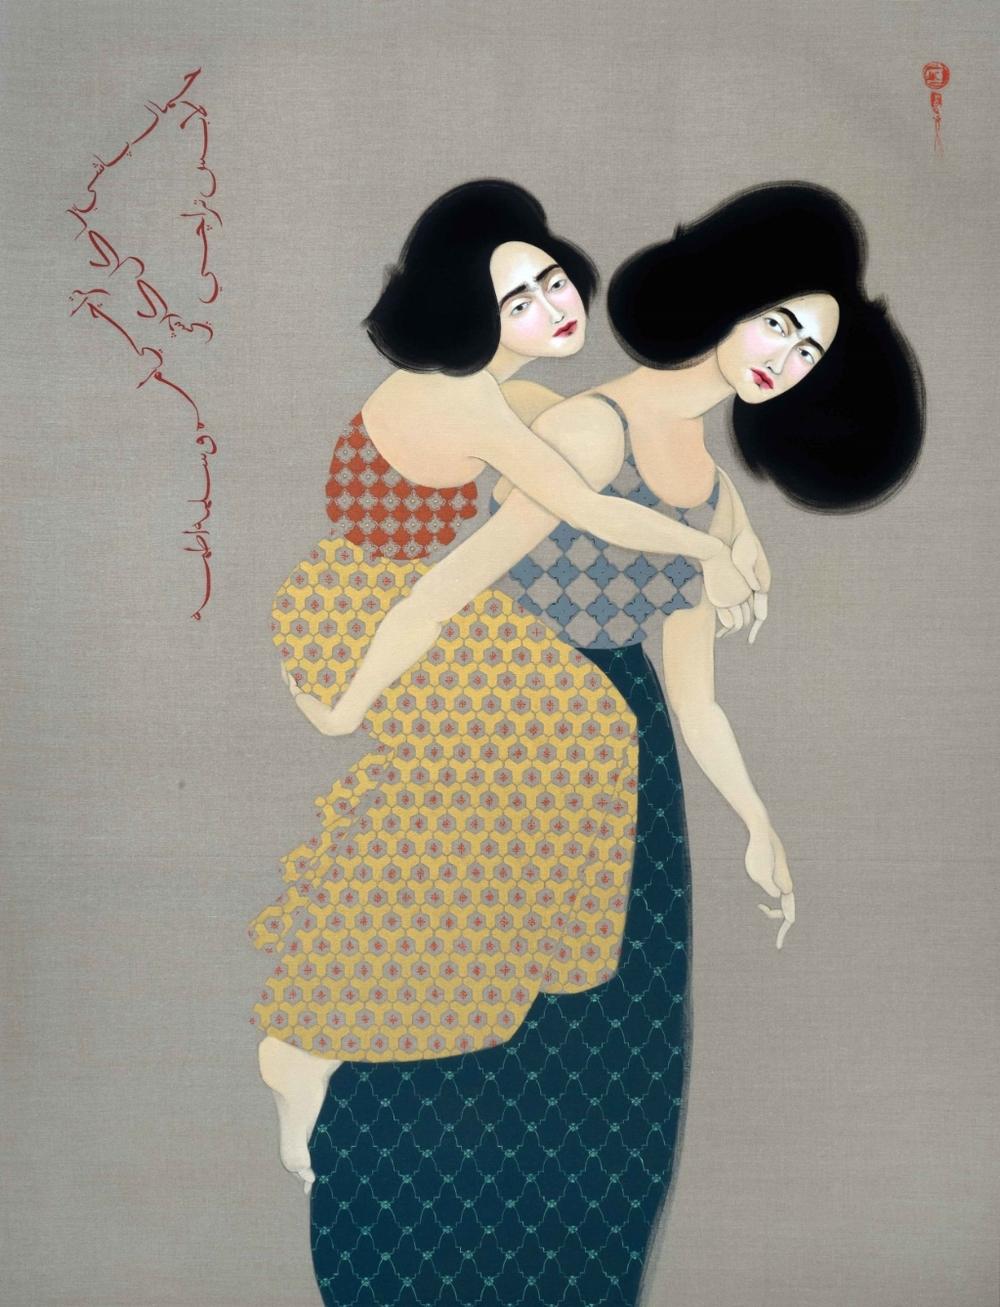 Hayv Kahraman, Hammal Bashi, 2015, Oil on linen, 177.8 x 137 cm